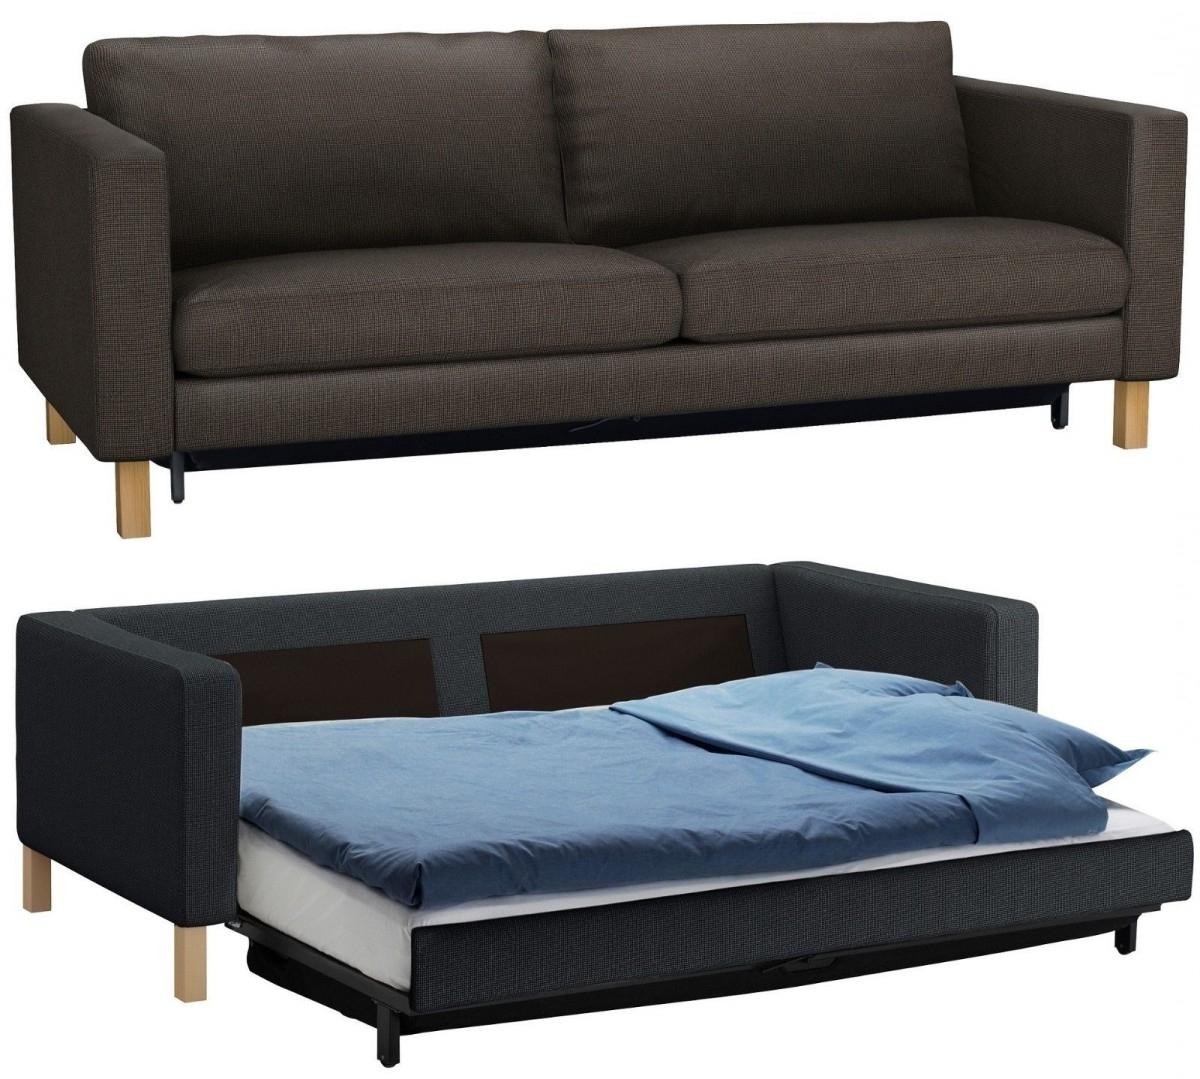 Ansugallery – Sleeper Sofa Design Within Most Popular Ikea Loveseat Sleeper Sofas (View 6 of 15)